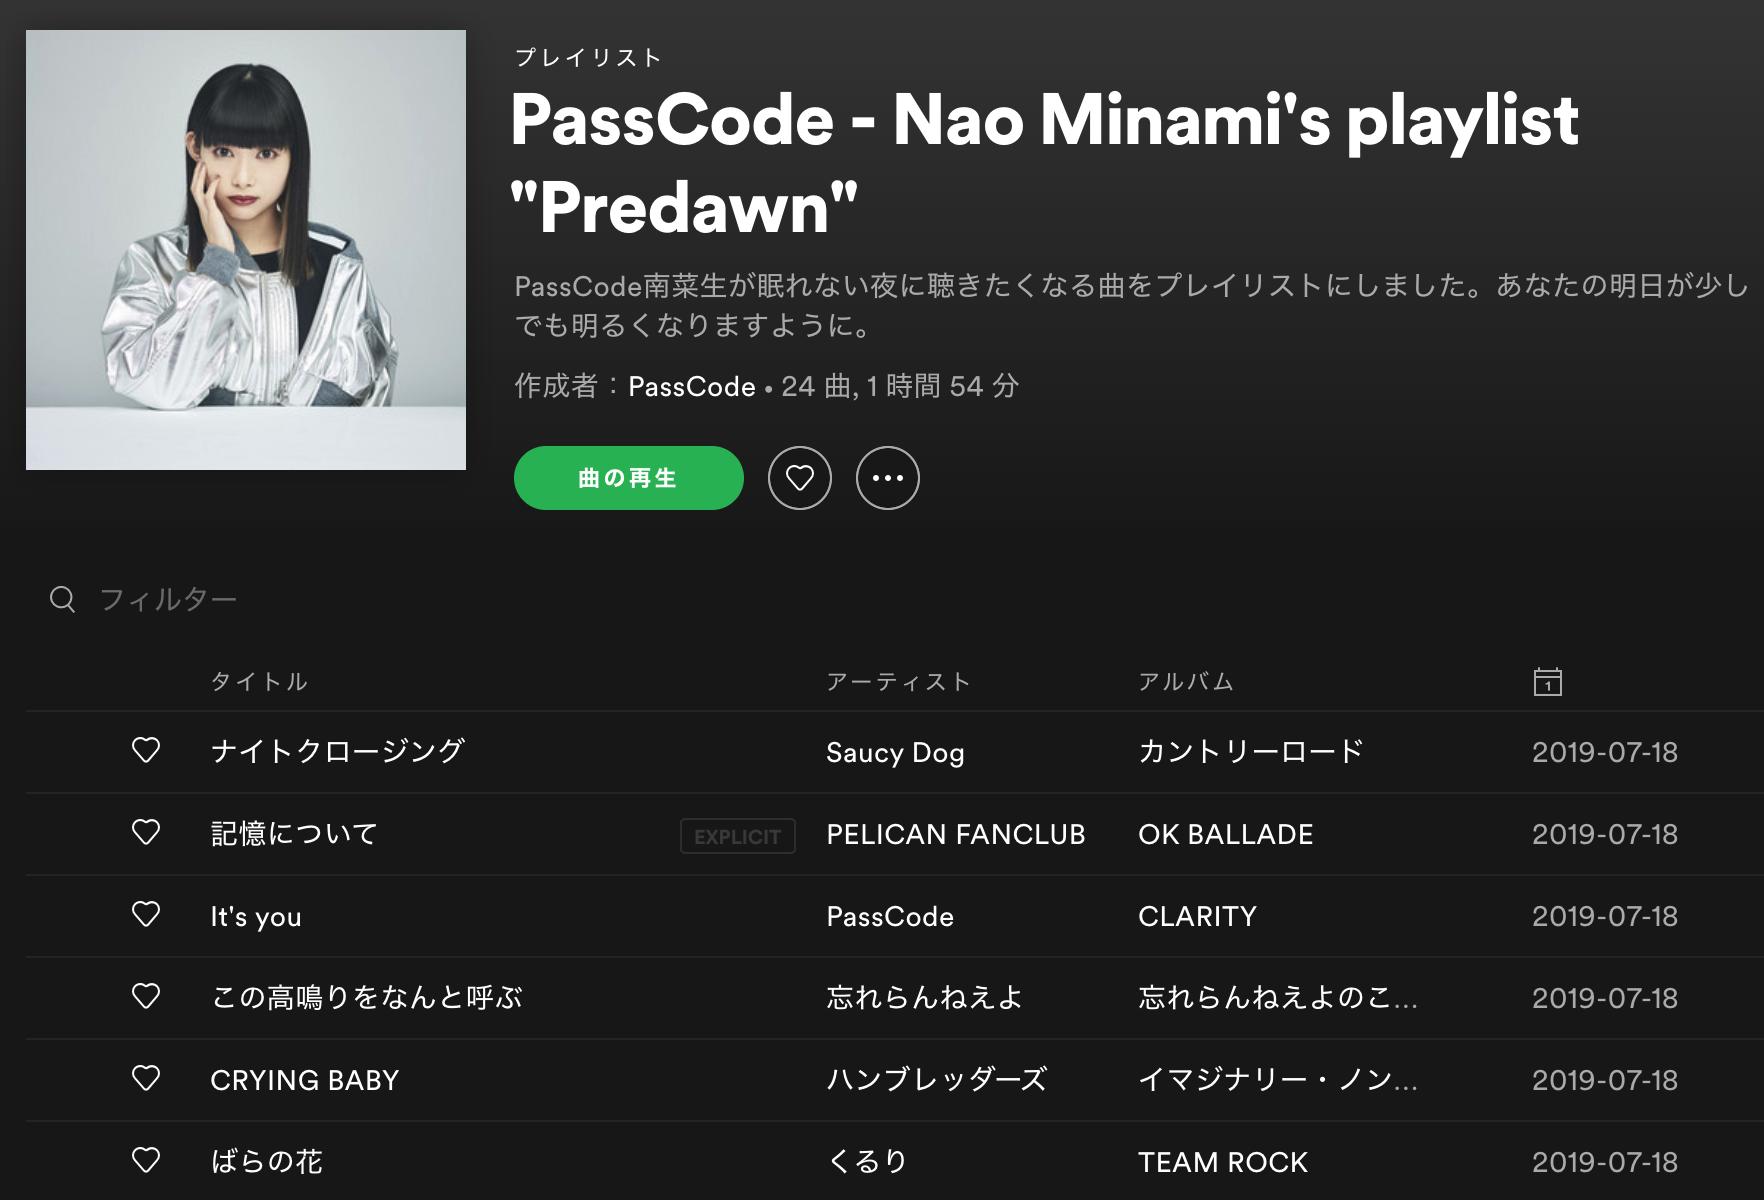 PassCode - Nao Minami's Playlist Predawn